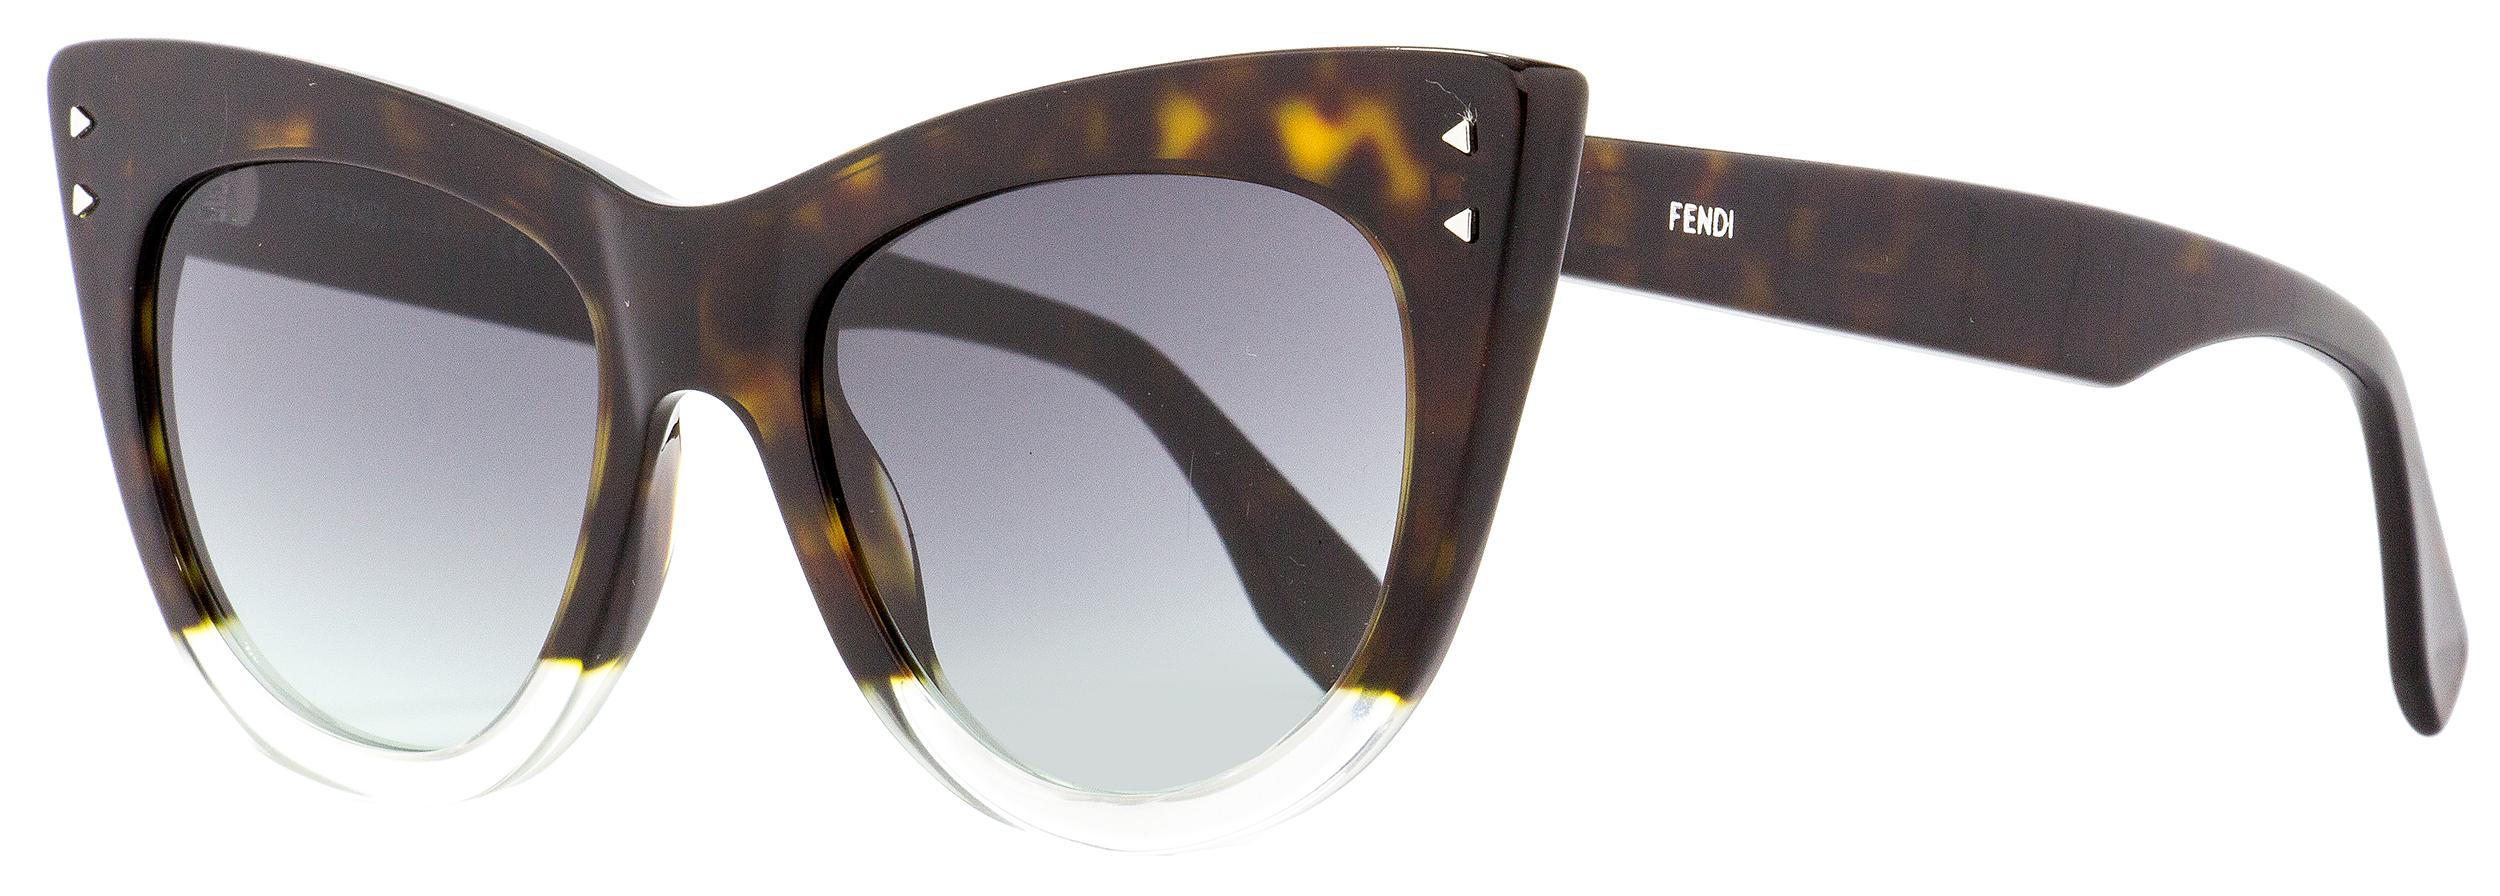 Fendi FF 0238/S - PHW/IB